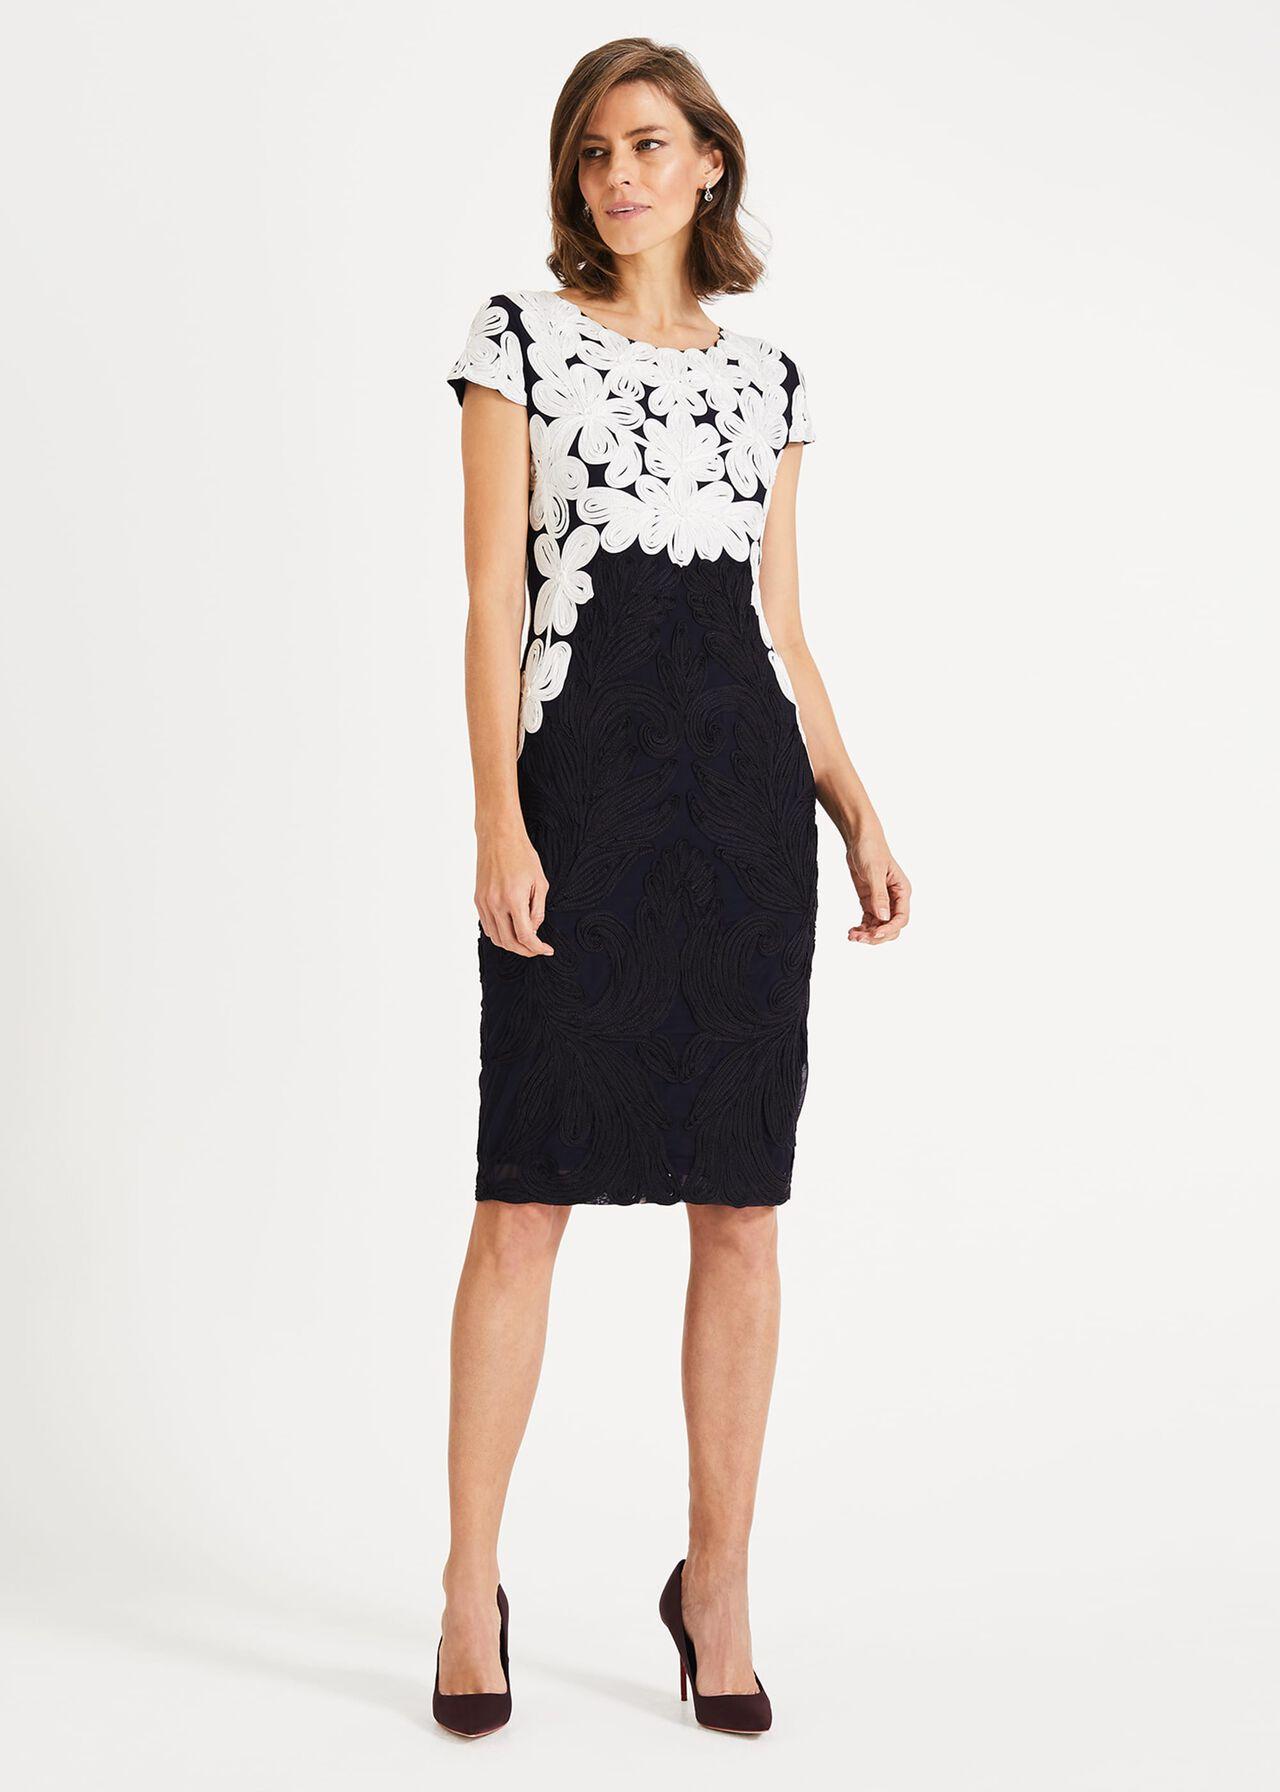 Catheleen Tapework Lace Dress